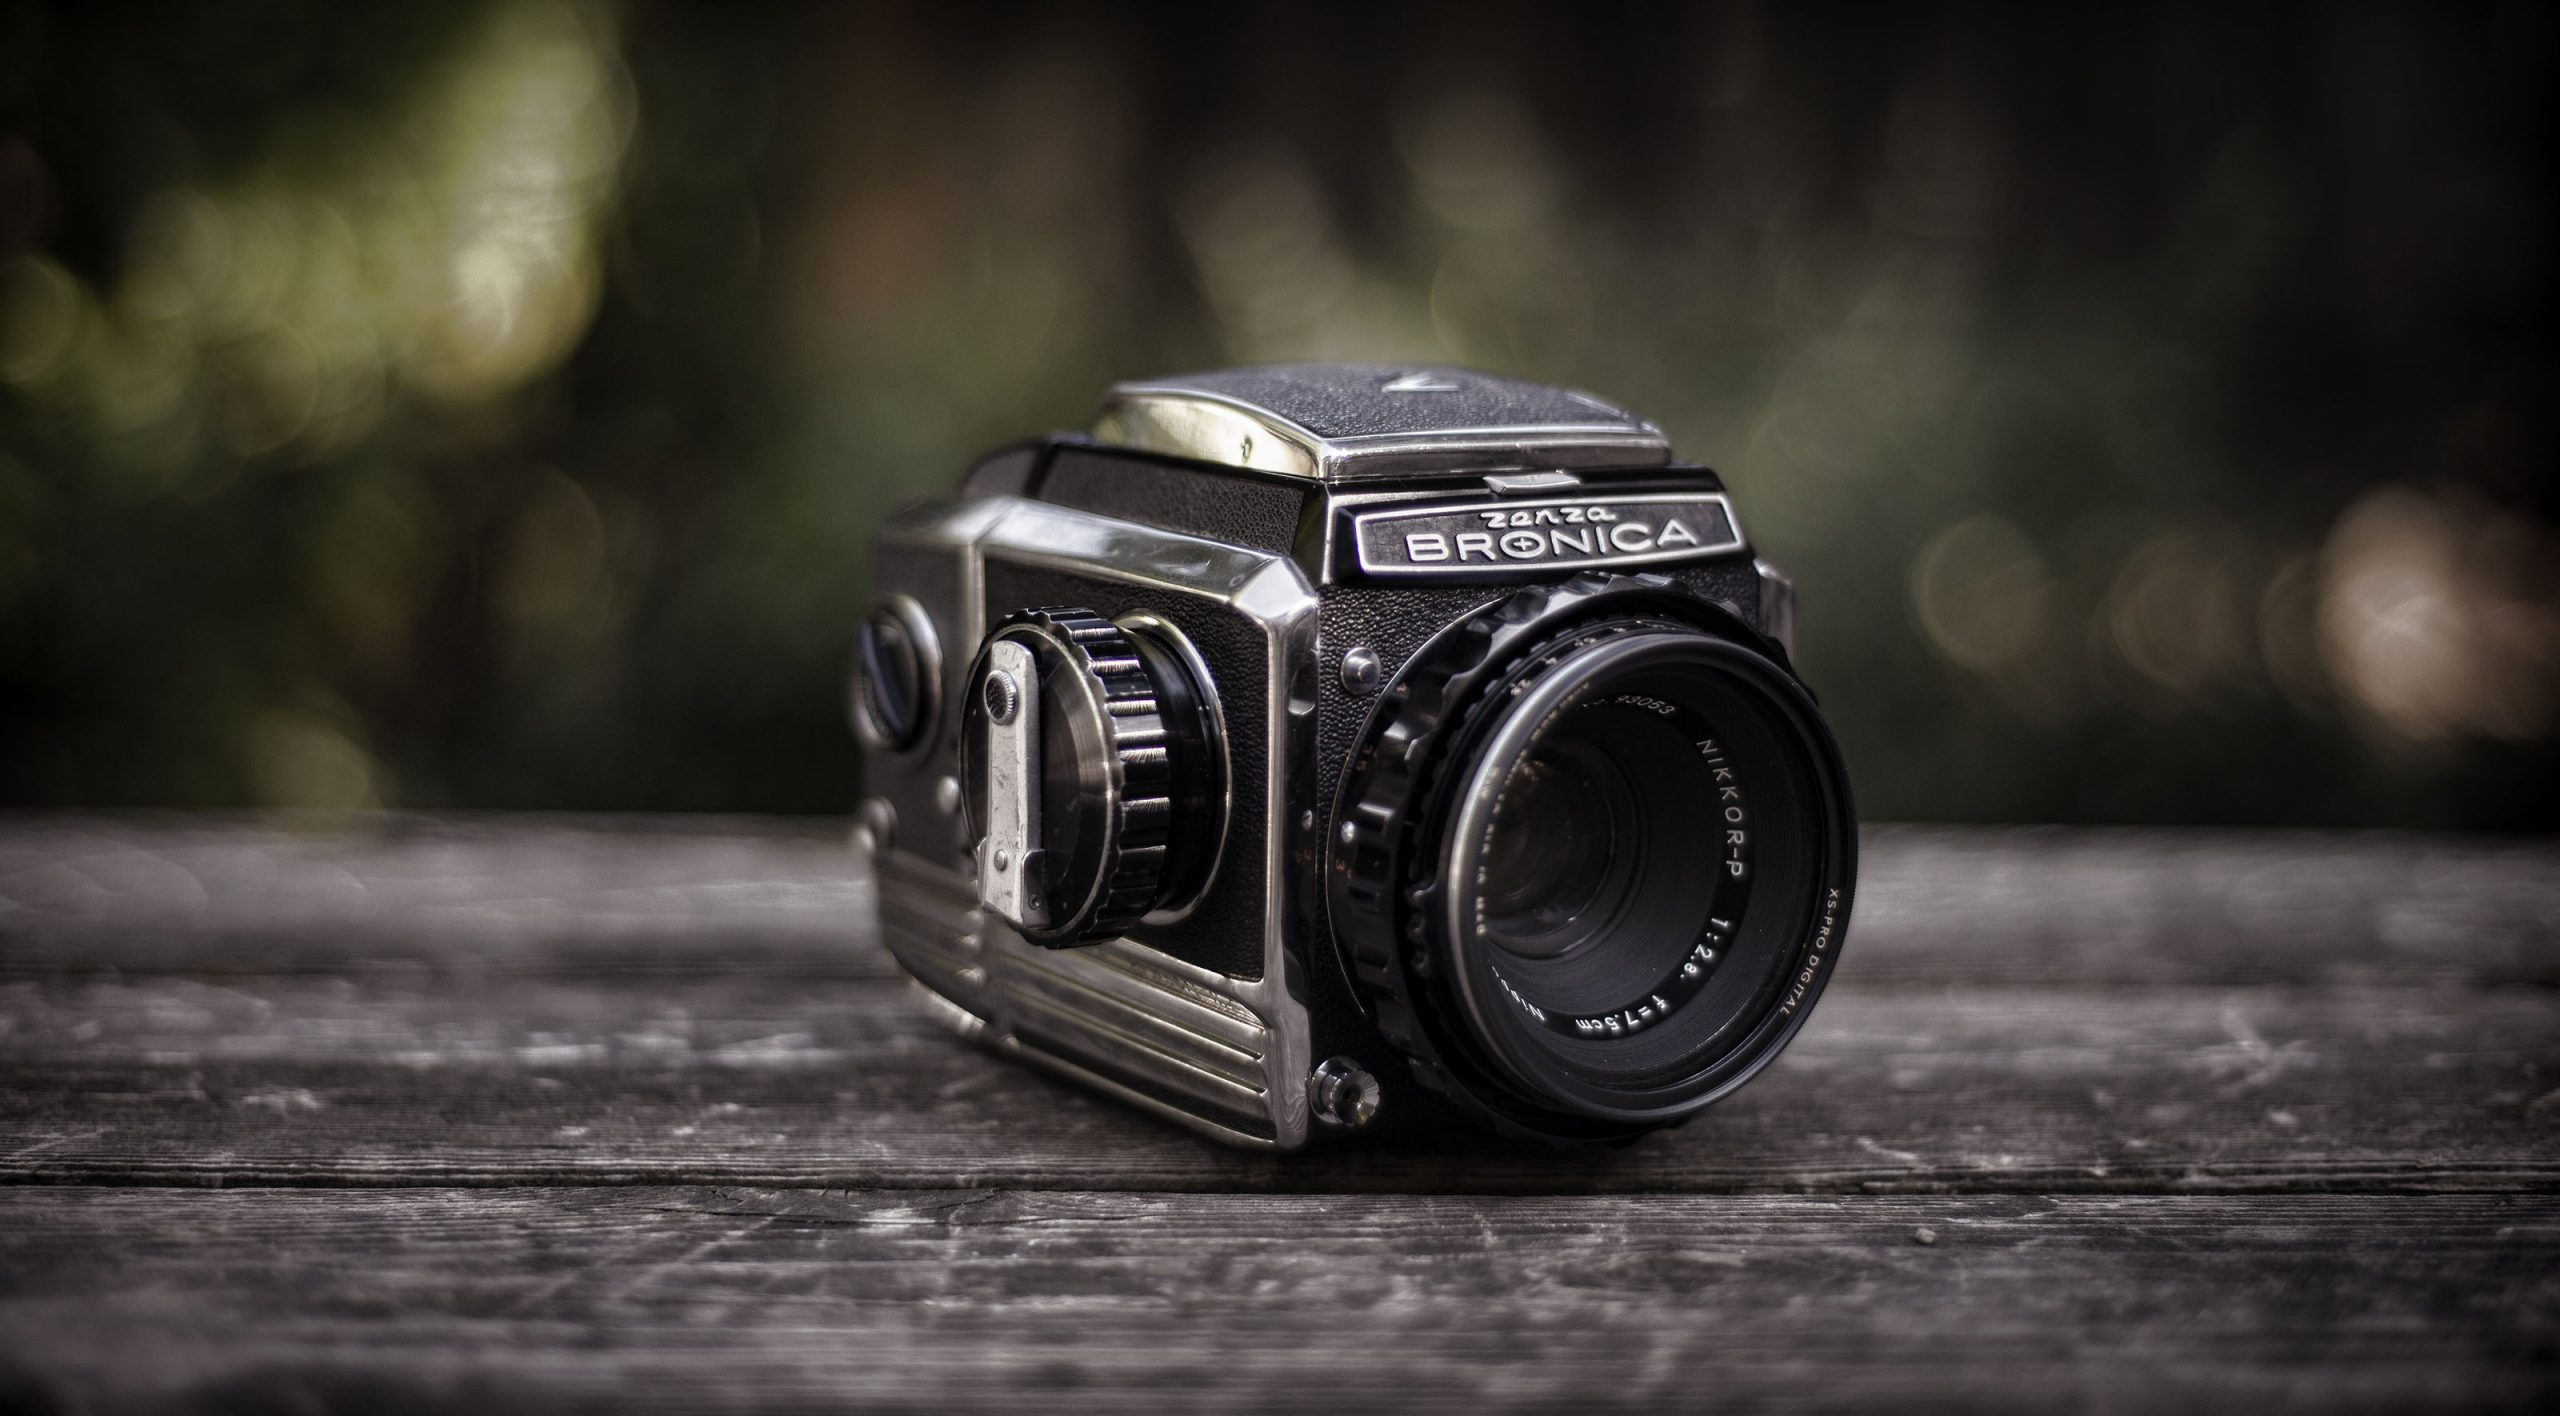 Bronica S2 medium format film camera